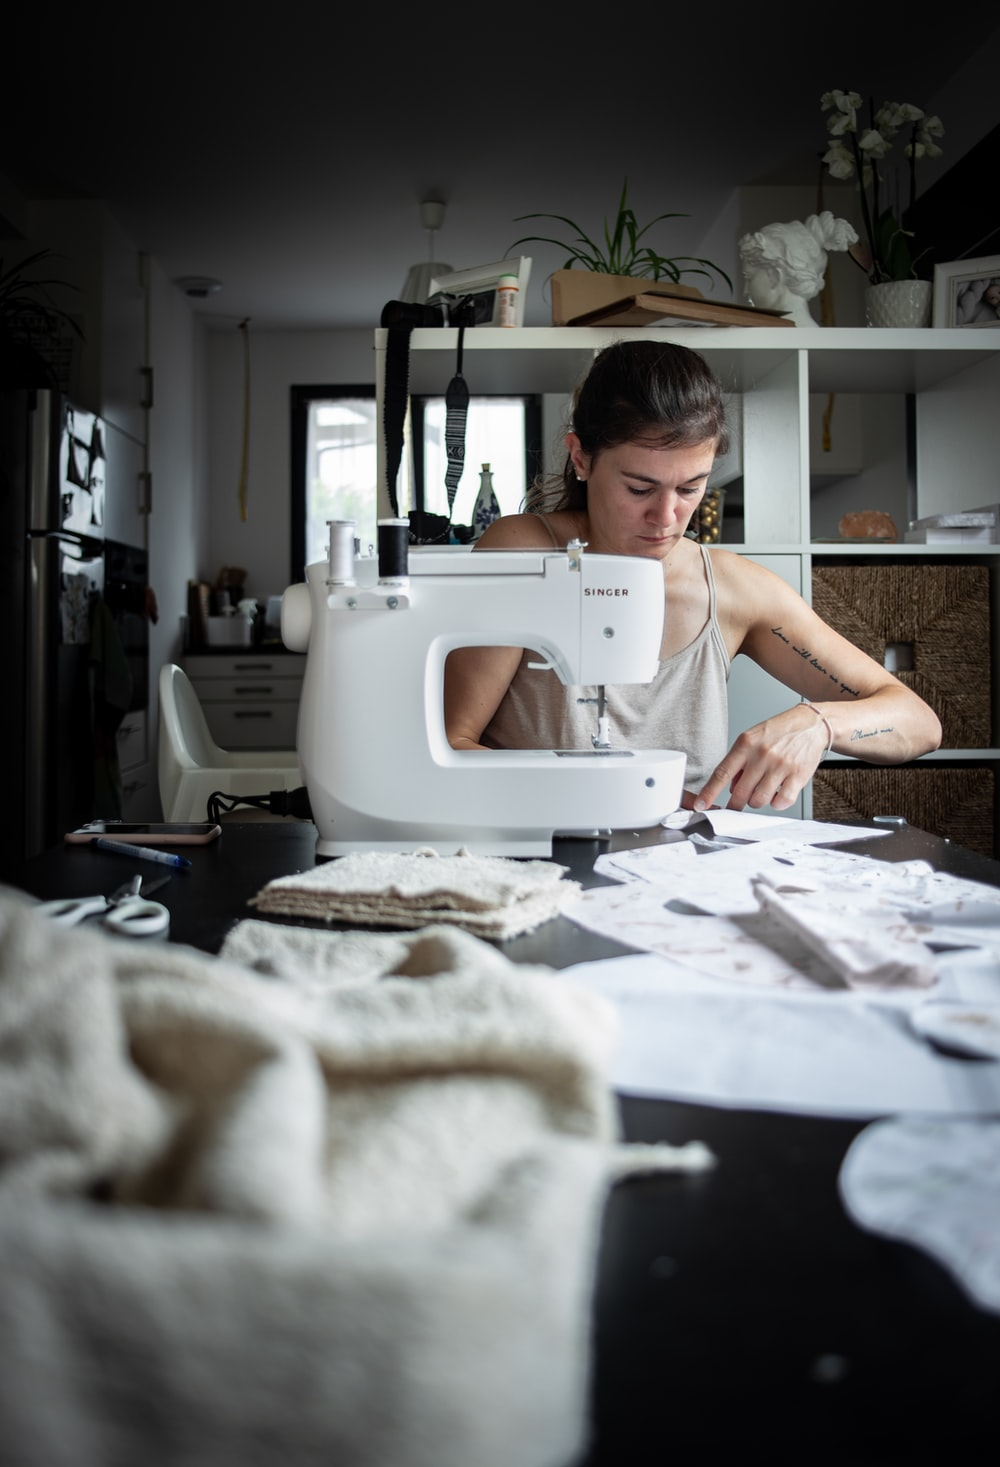 woman sewing at table